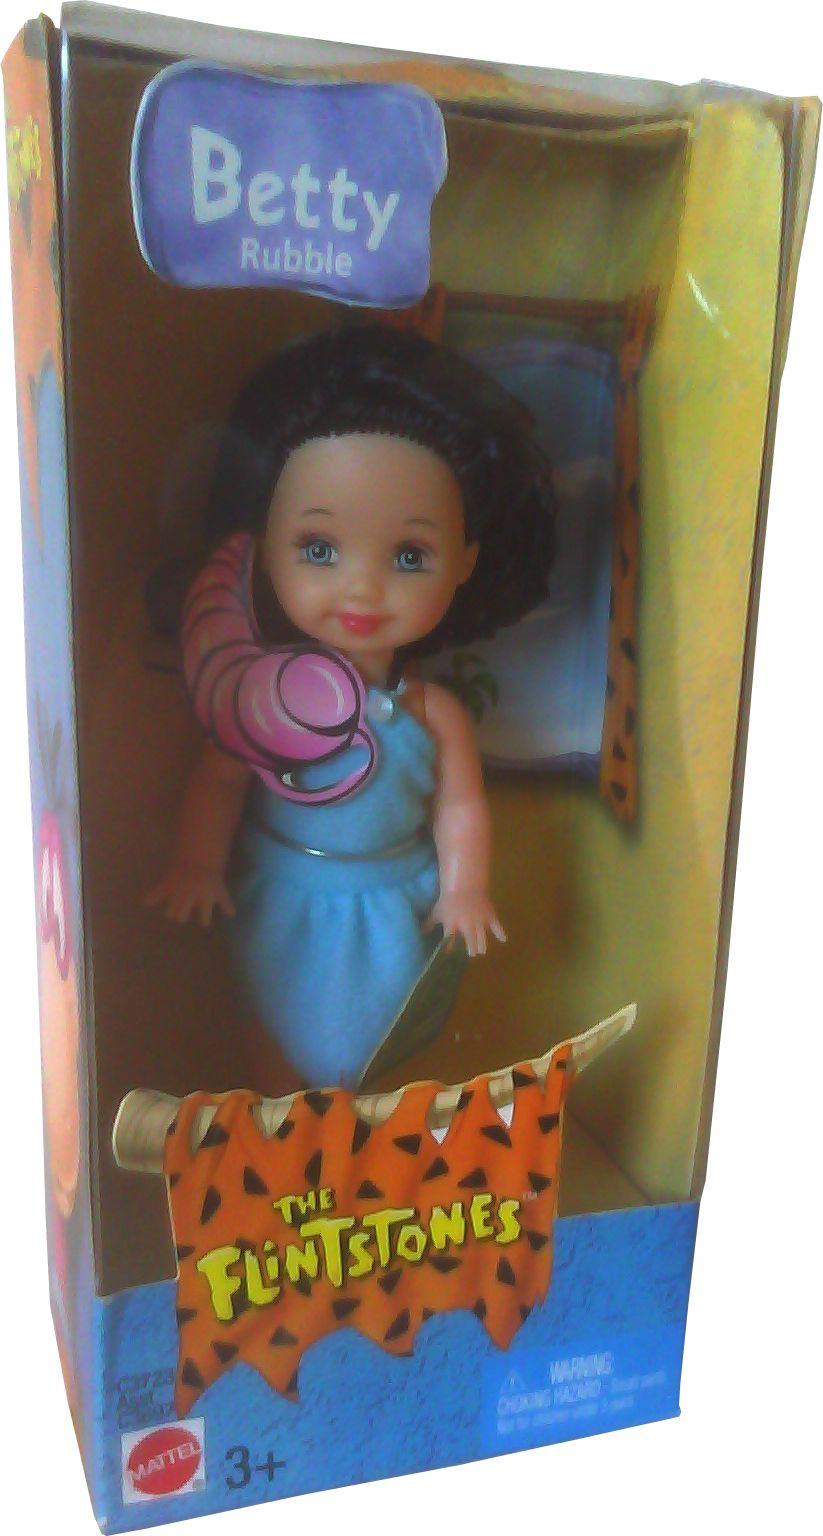 MATTEL Barbie KELLY DOLL CLOTHES FLINTSTONES BETTY RUBBLE DRESS NEW FROM BOX